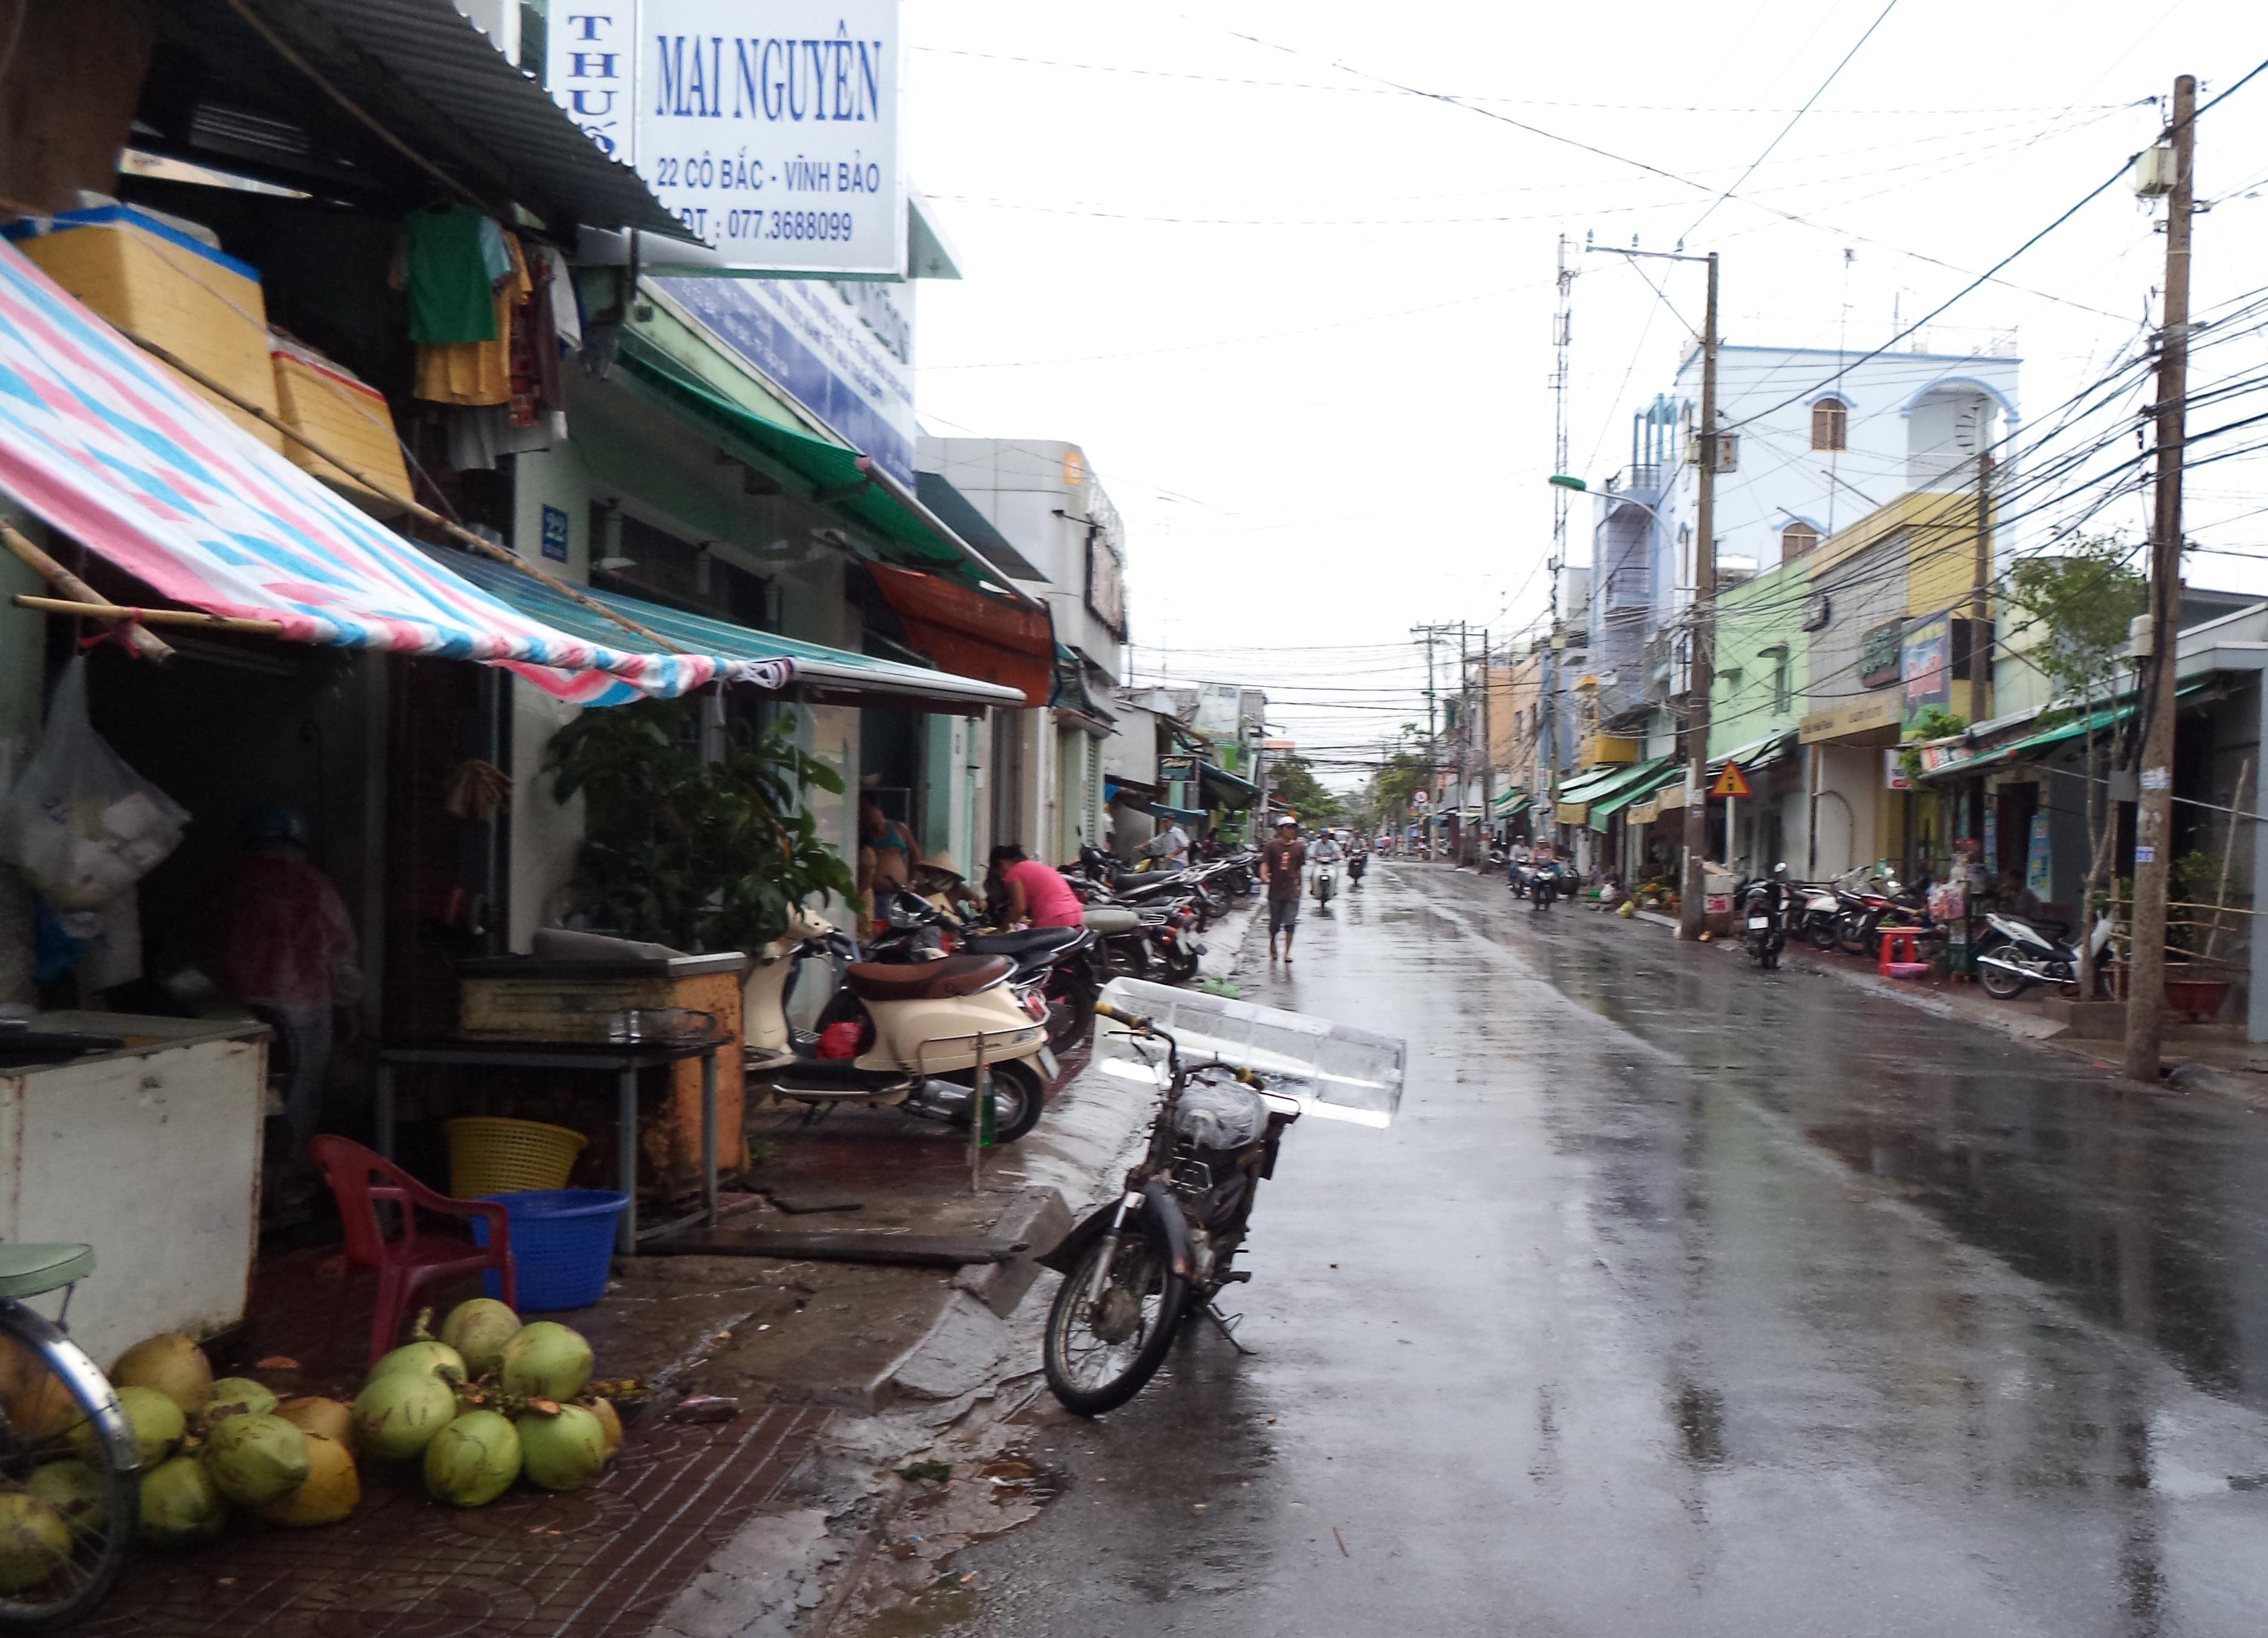 Rach Gia (Kien Giang) Vietnam  city photo : ... delta: Kien Giang 1 v 1 Hanoi T&T, 20/07/2013 | Vietnam Football 2014